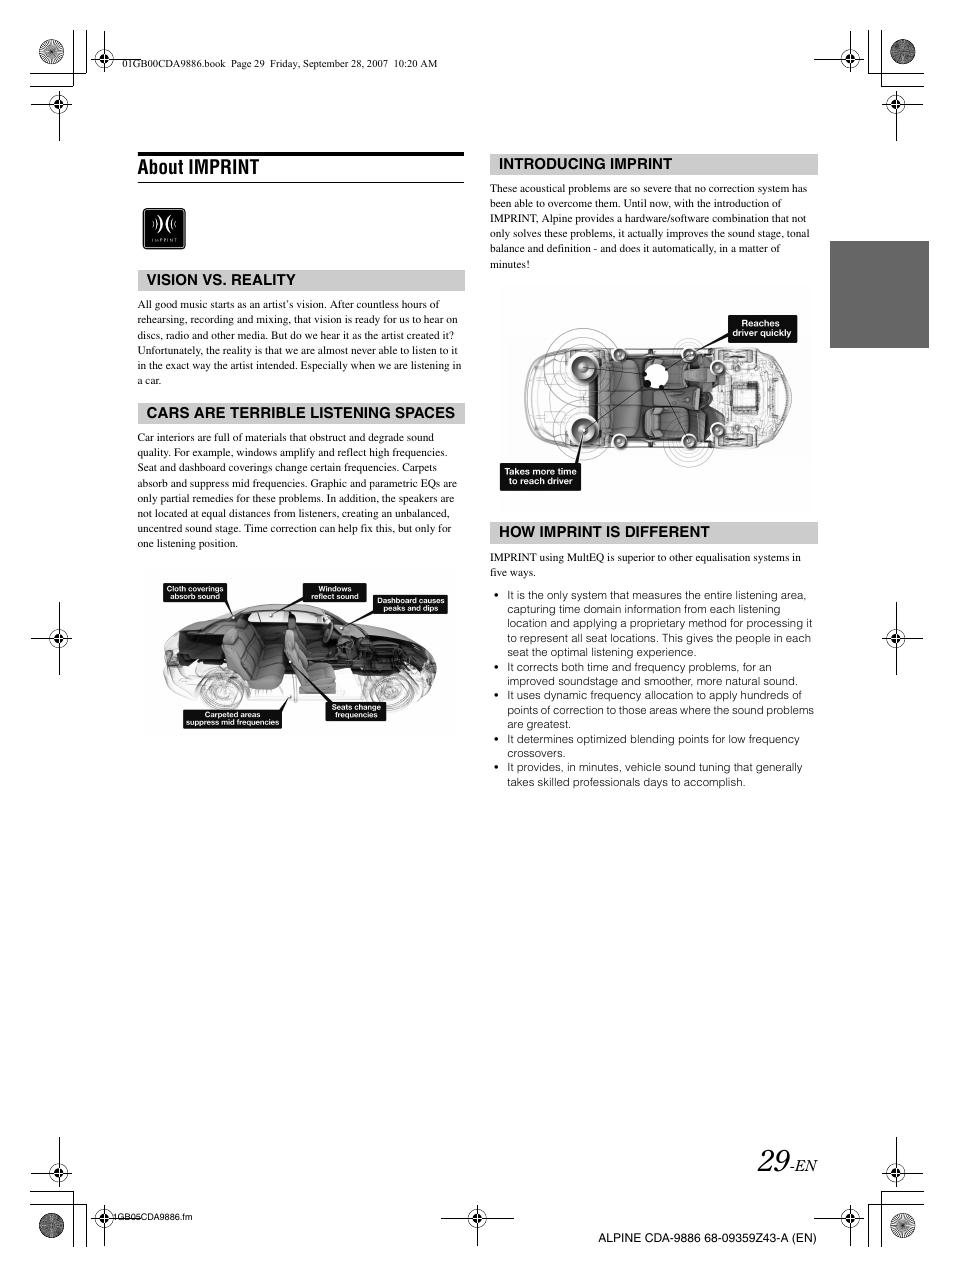 about imprint alpine cda 9886 user manual page 31 88 rh manualsdir com CDA-9886 IA Net cda 9886r manual